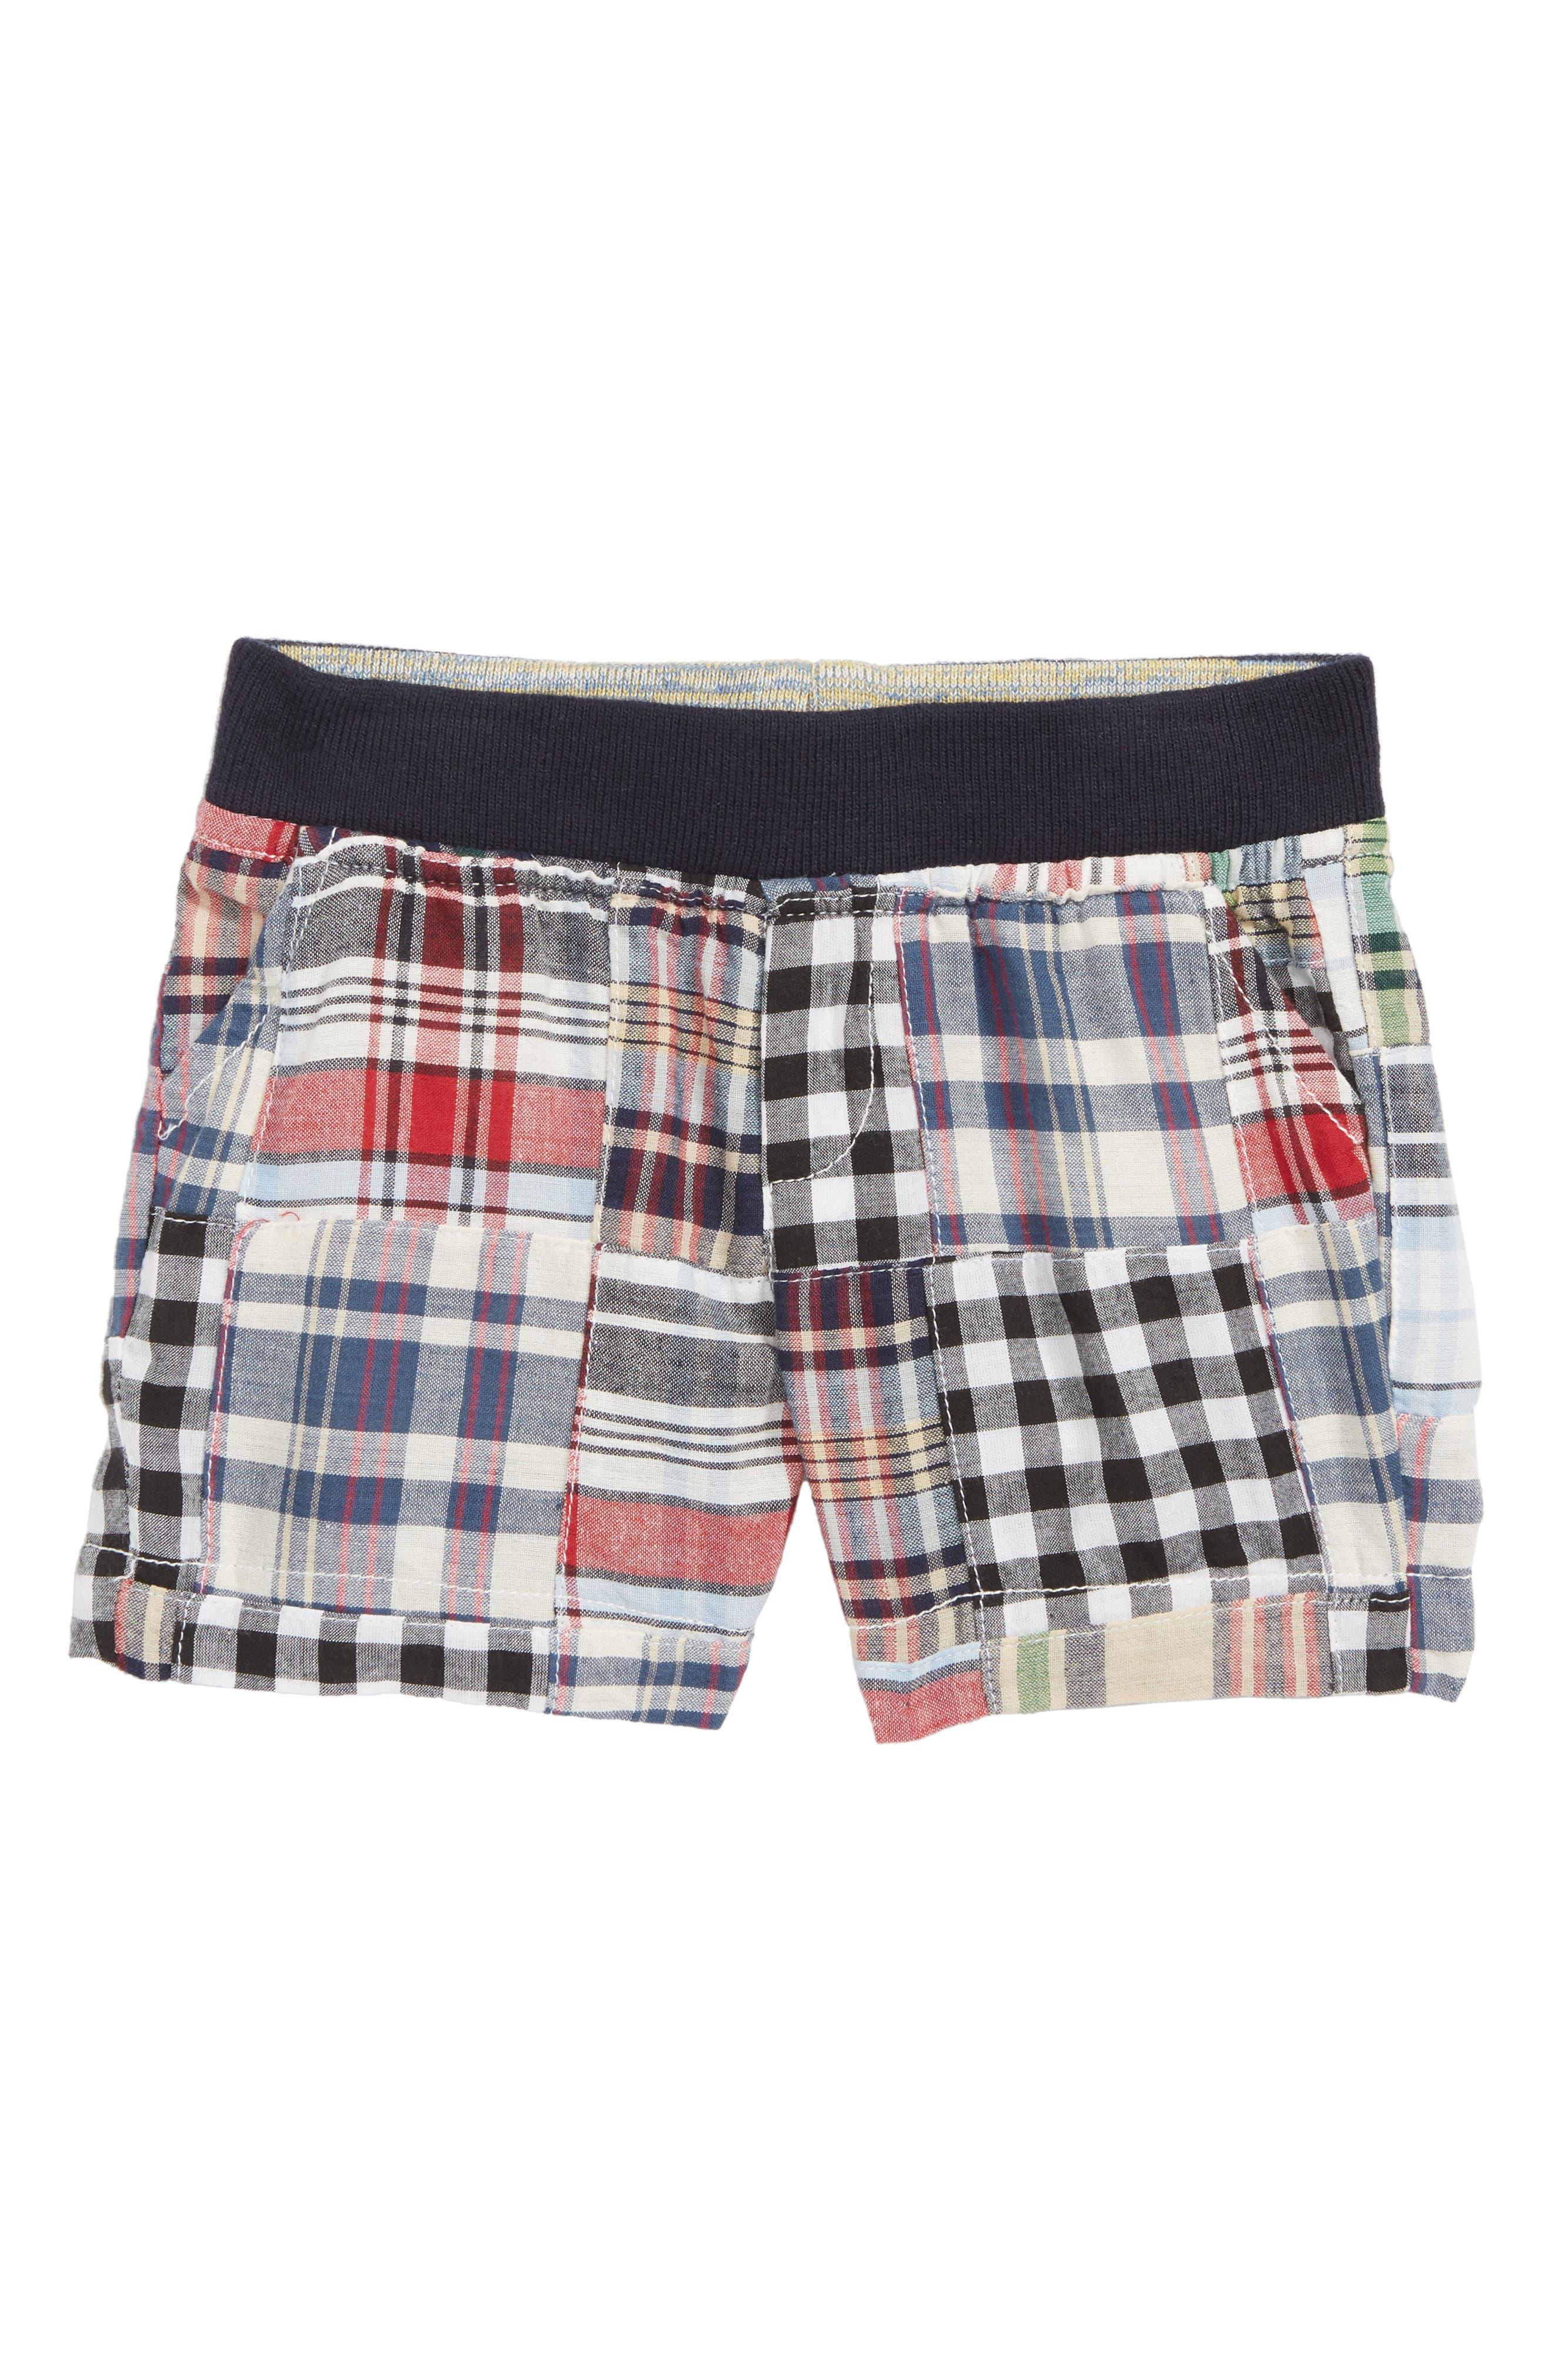 Maxwell Patchwork Plaid Shorts,                             Main thumbnail 1, color,                             400